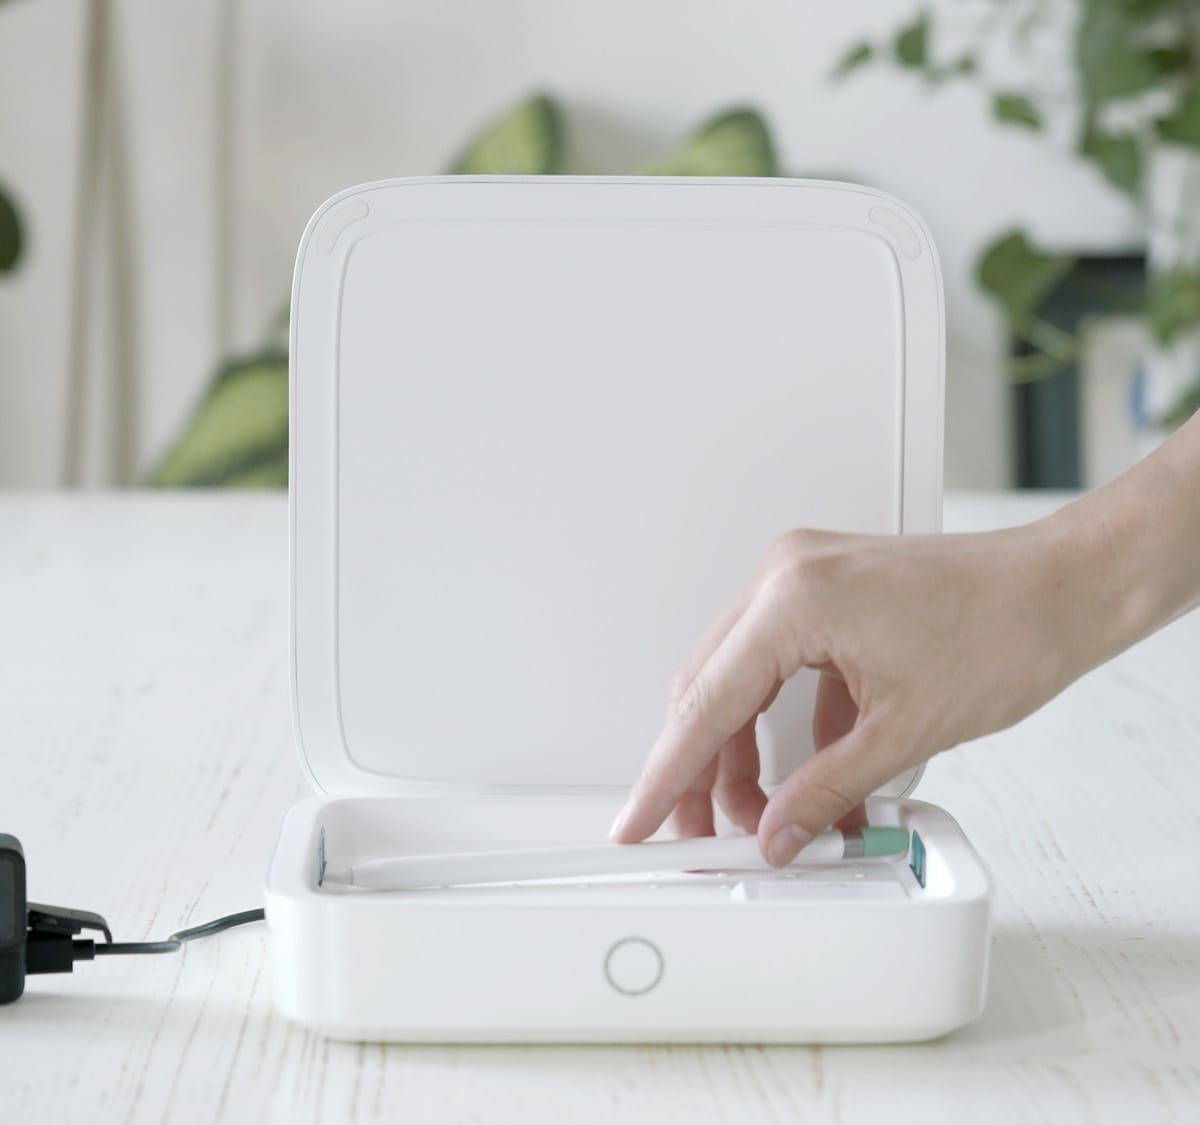 Einova Mundus Pro sanitizing device kills 99.99% of viruses and bacteria in 8 minutes